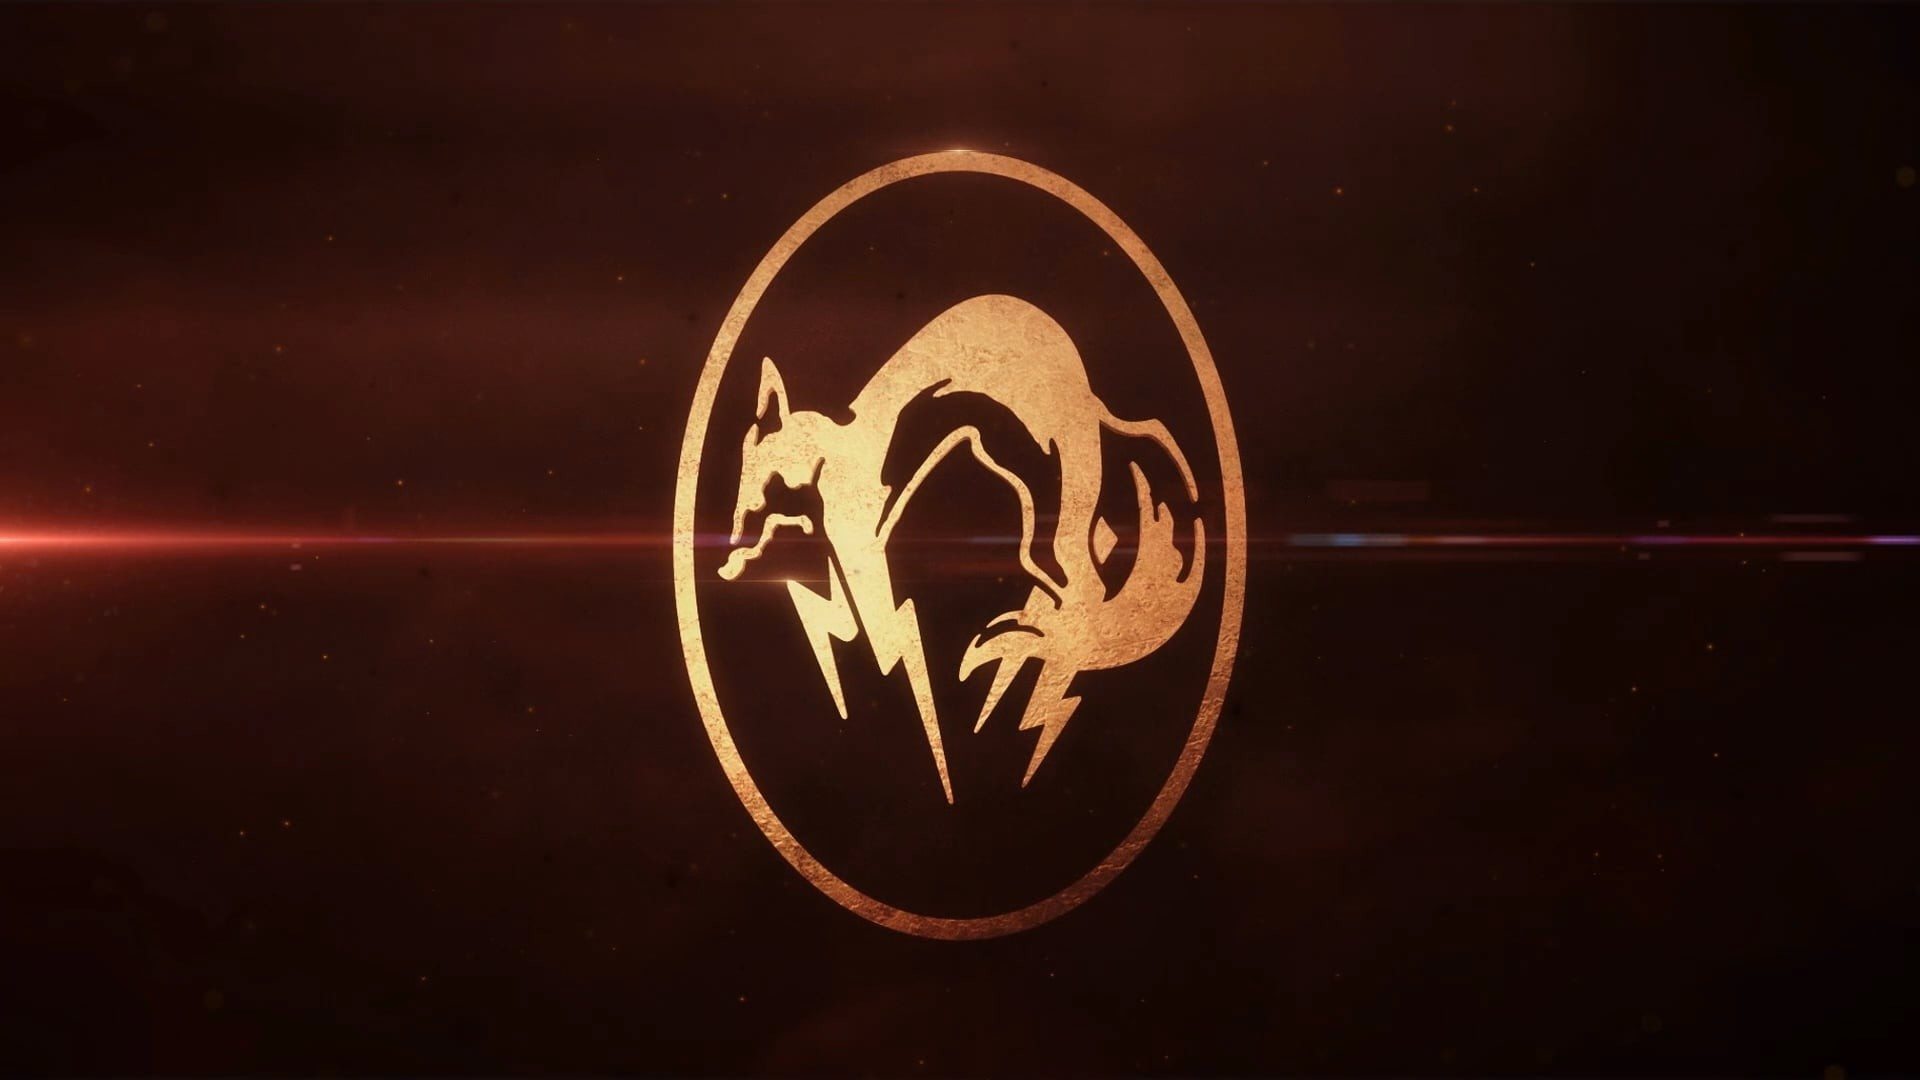 Metal Gear Solid 5 The Phantom Pain fox logo